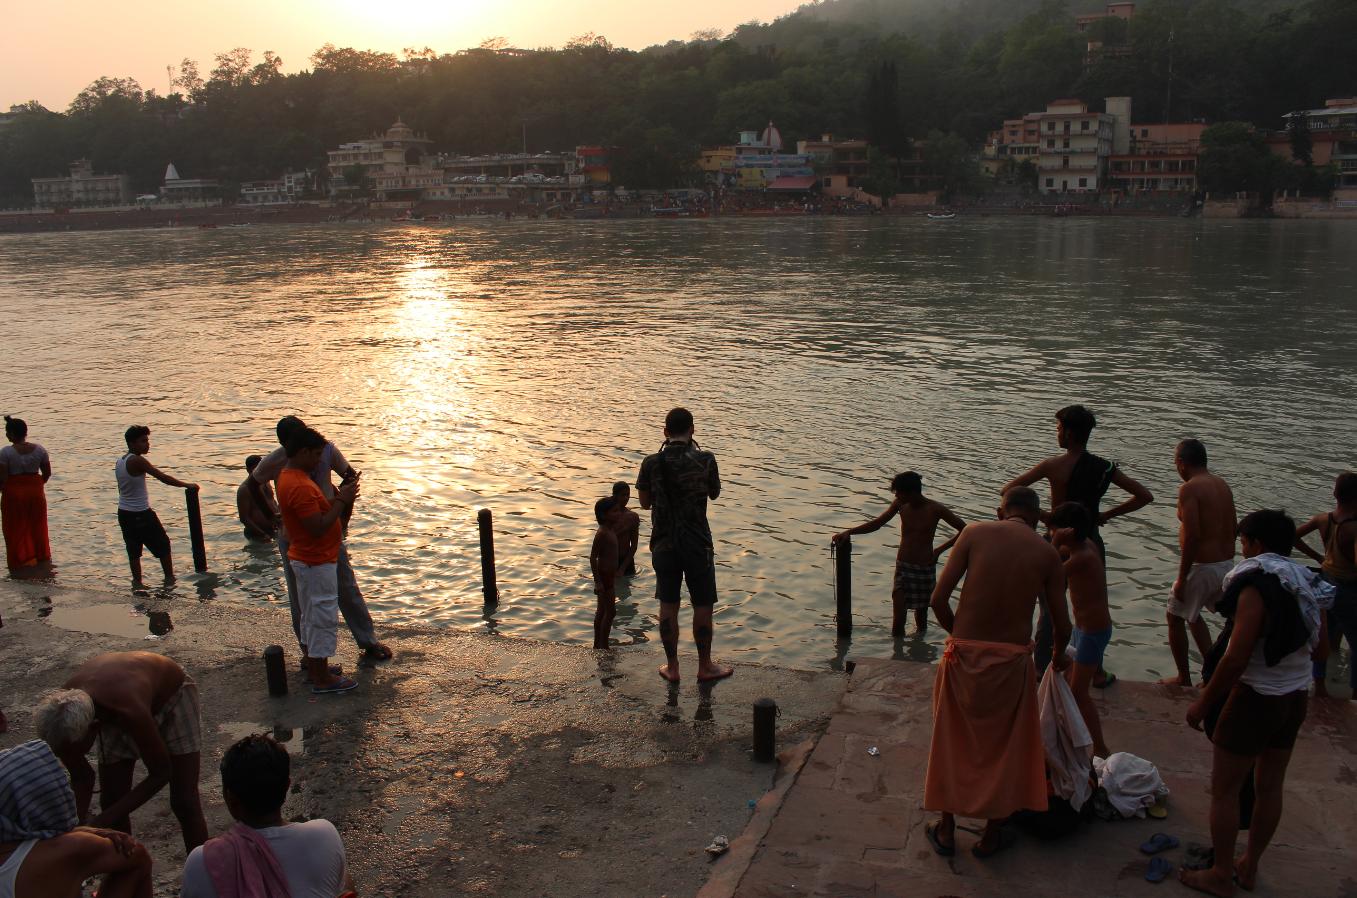 Rishikesh, India - Photograph by Angar Awj